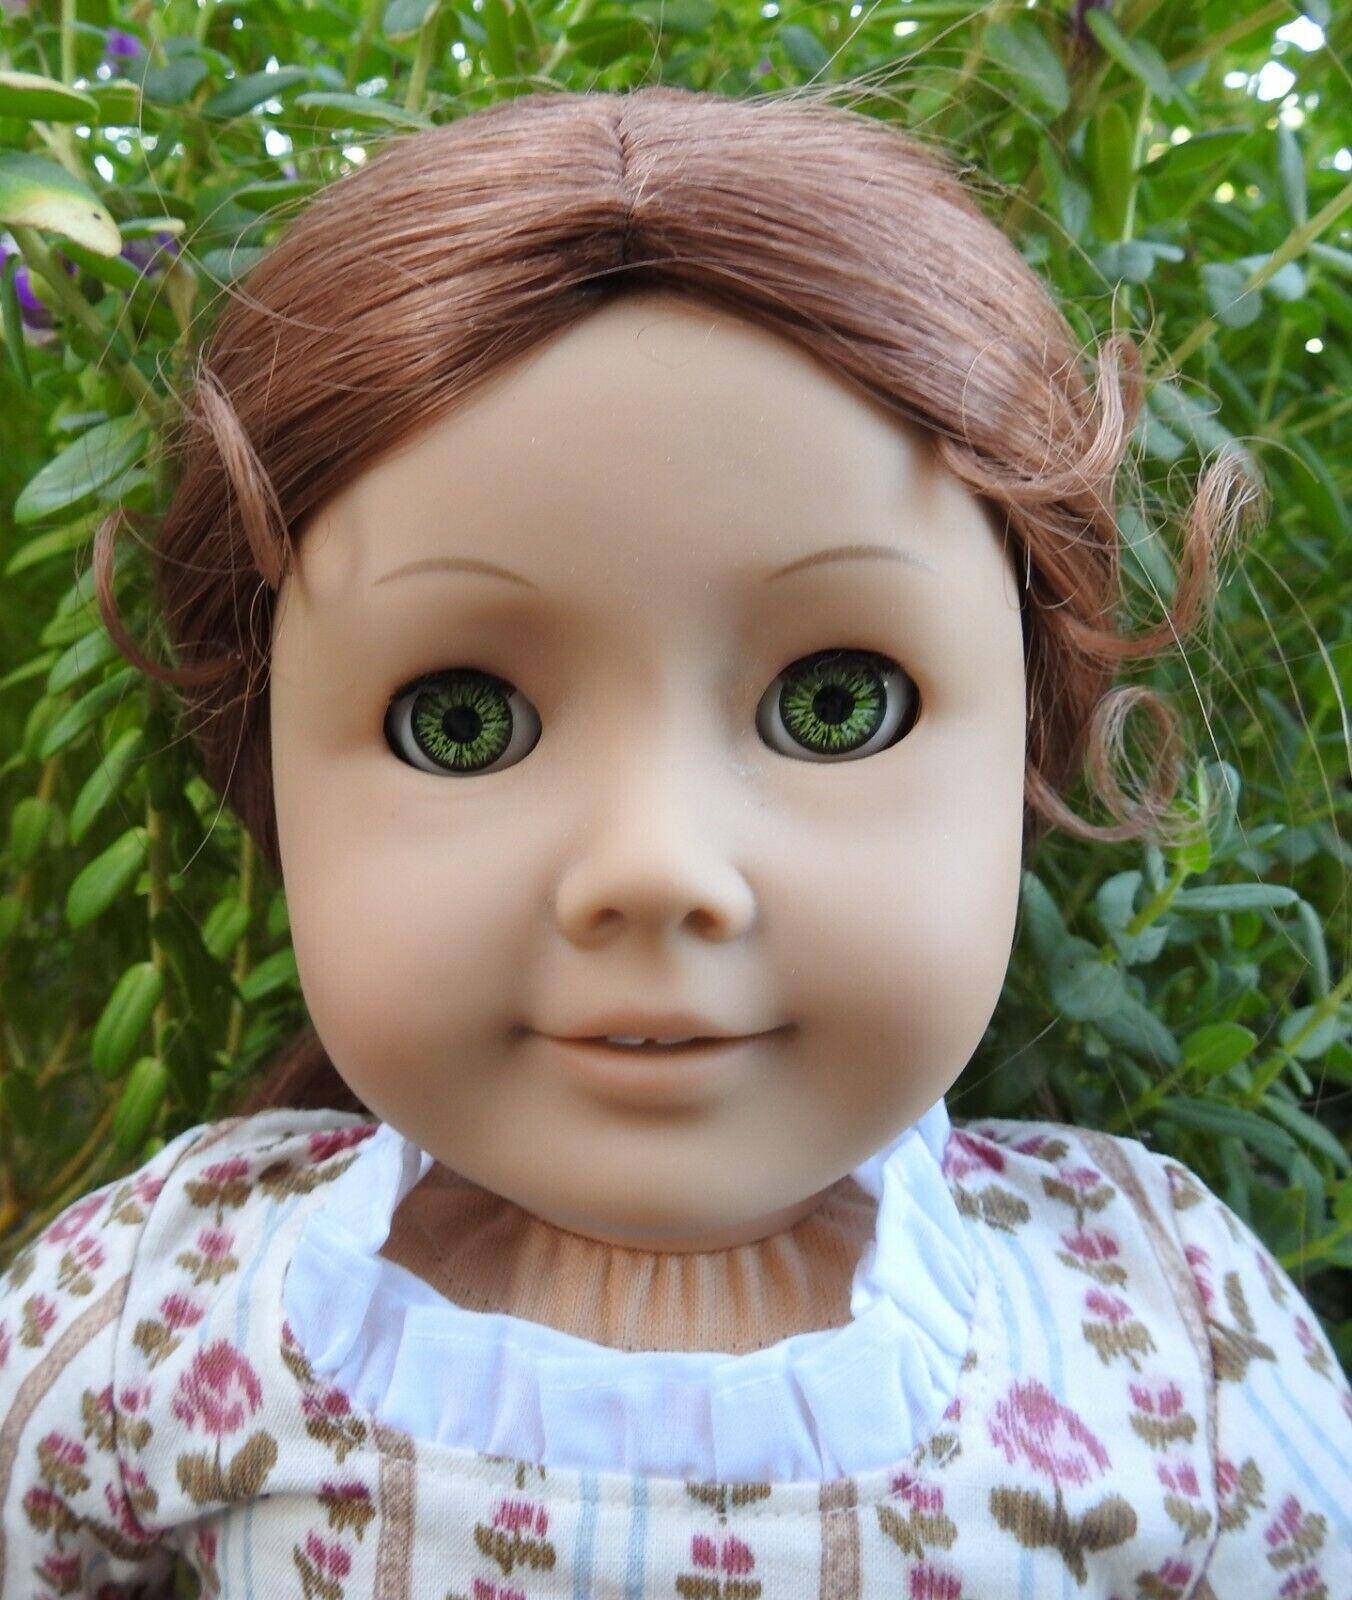 American Girl Doll Early Edition Felicity - $210.00